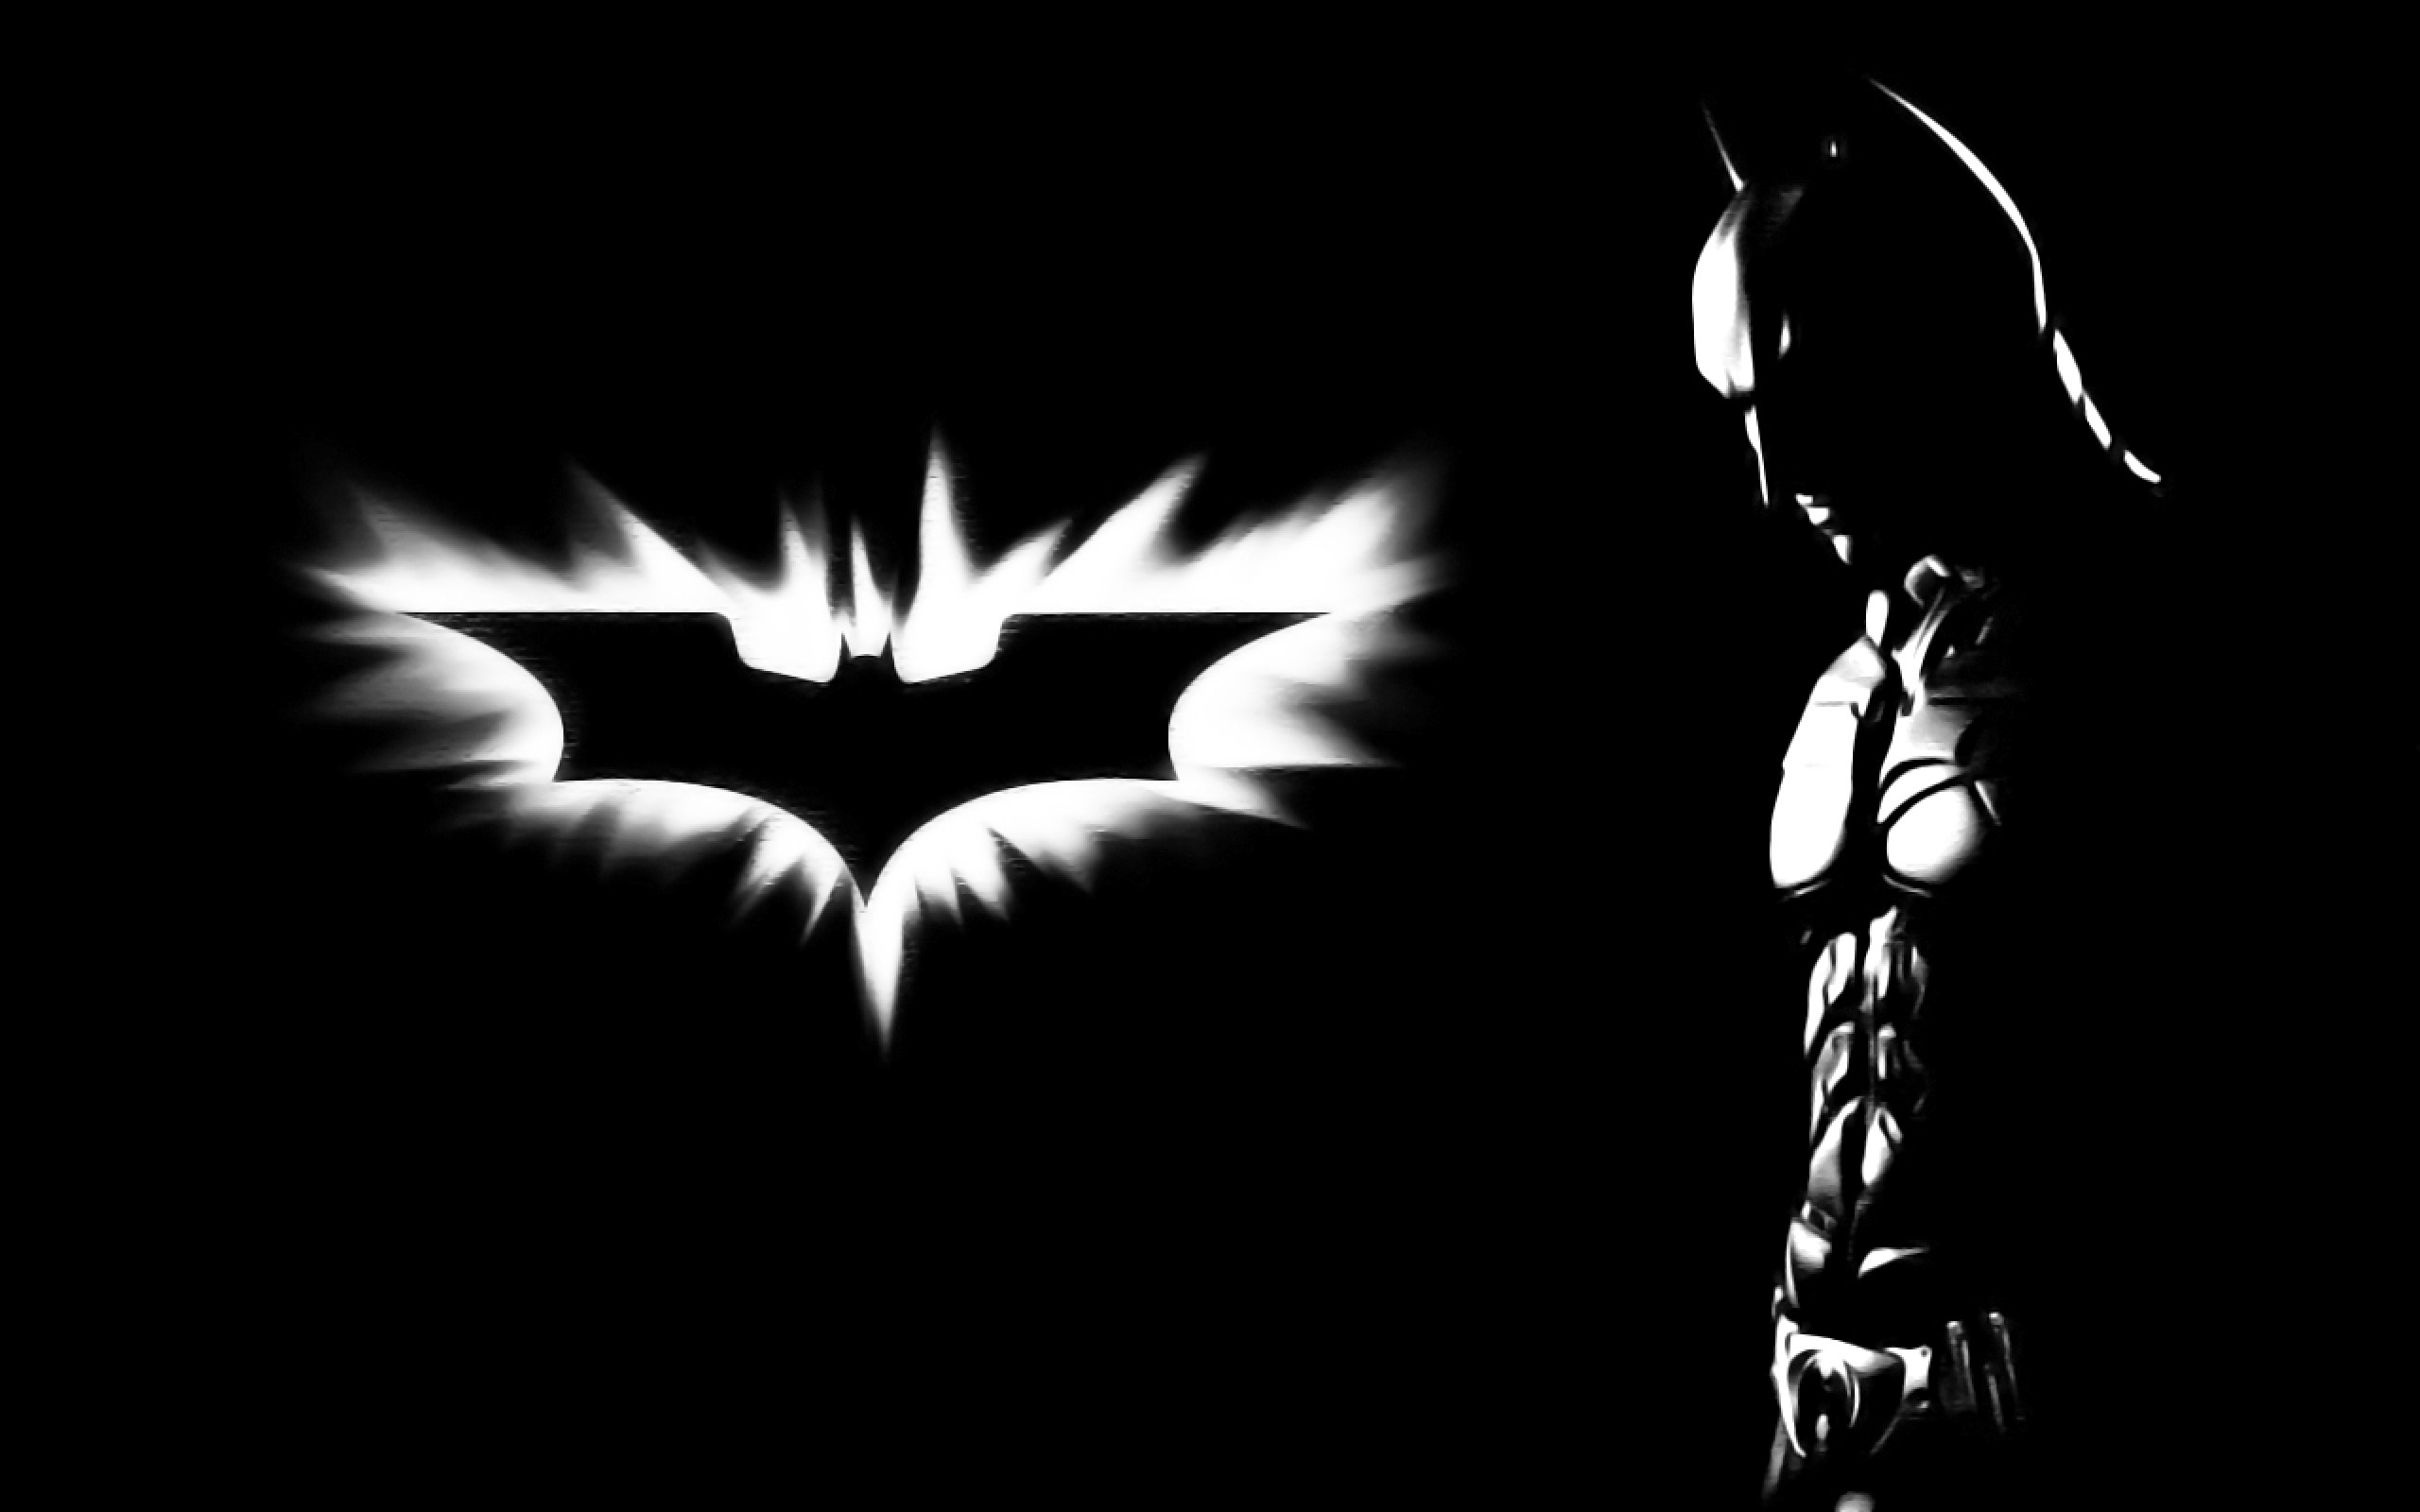 Fantastic Wallpaper Mac Batman - 1037928-batman-desktop-background-2560x1600-windows-10  Pic_894020.jpg